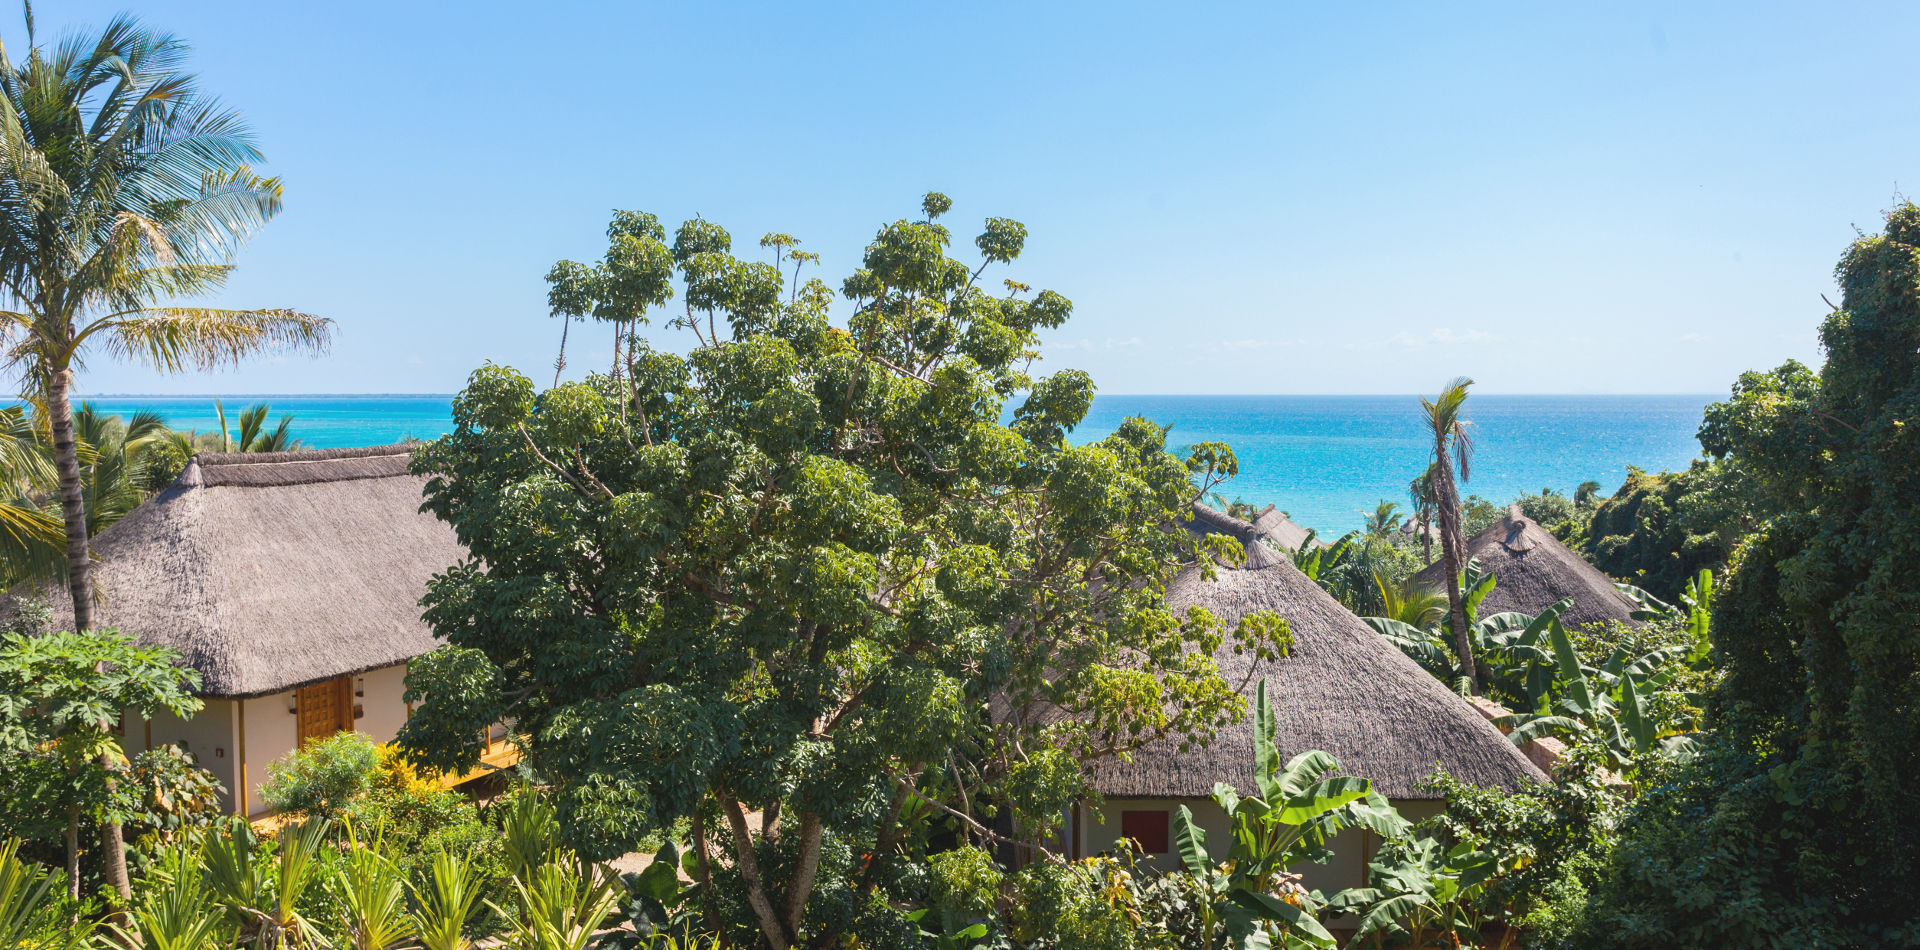 Boutiquehotel Zuri Zanzibar Sansibar Tansania, Luxushotel Sansibar, Luxusreise Tansanita Badeaufenthalt Sansibar